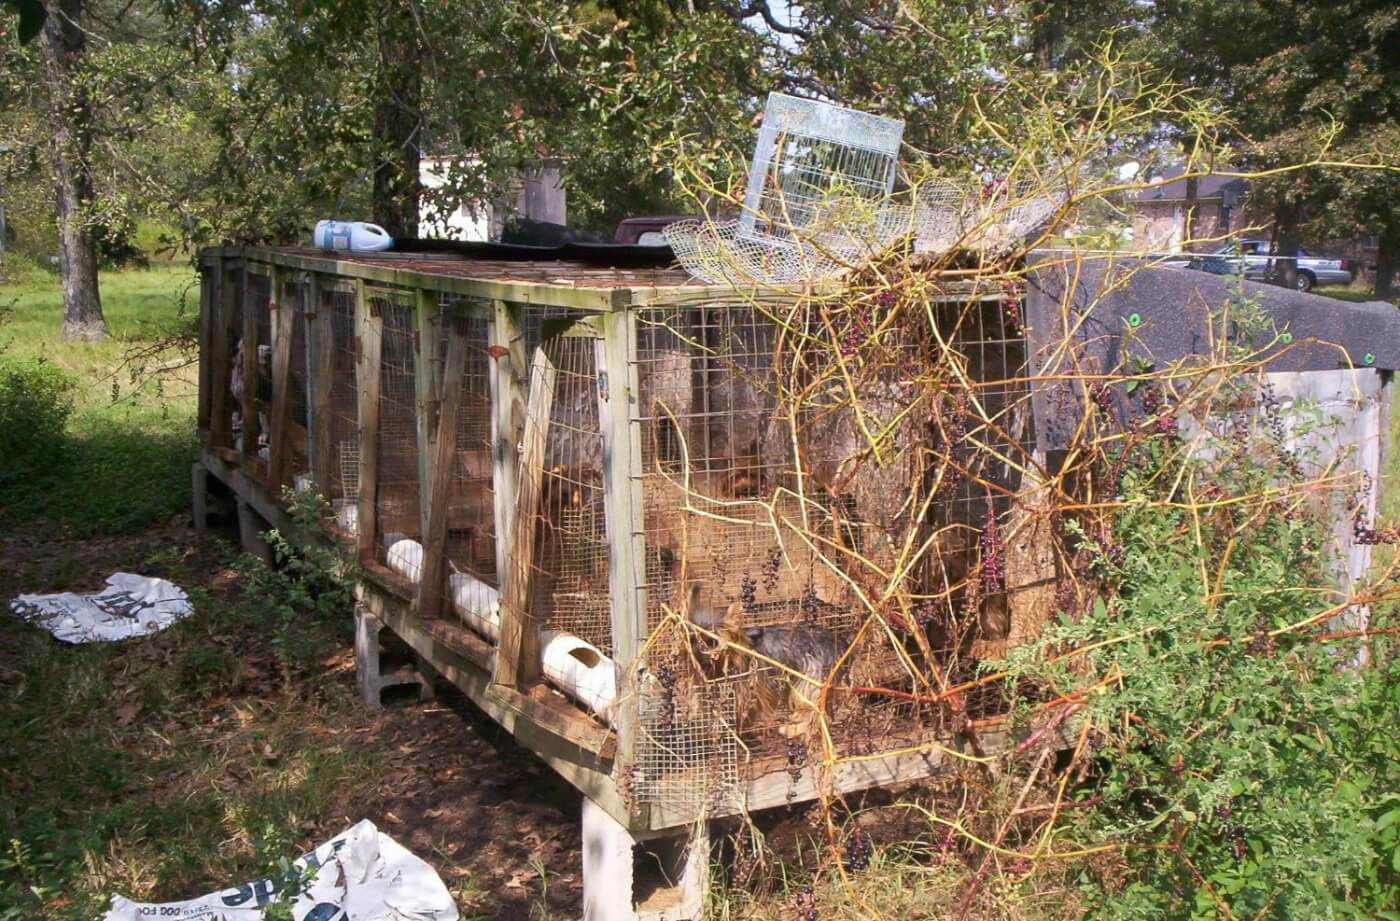 Filthy, broken-down enclosures at puppy mill